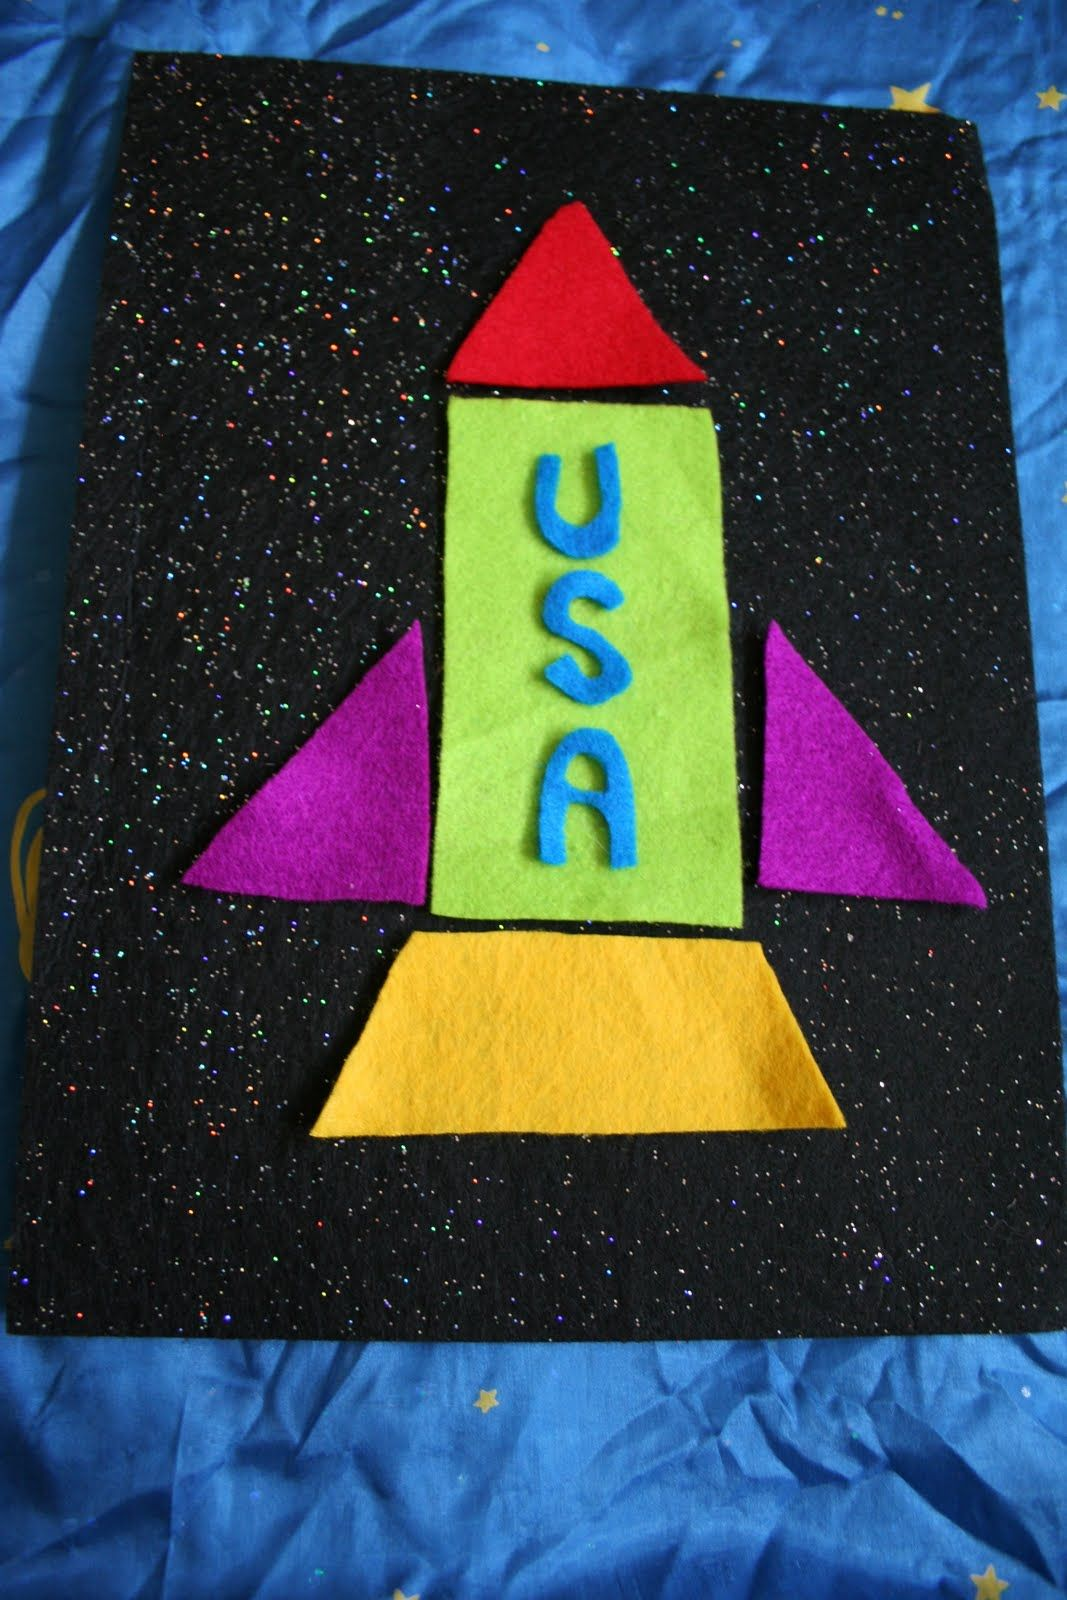 Homemade Outer Space Felt Board And Felt Build A Rocket